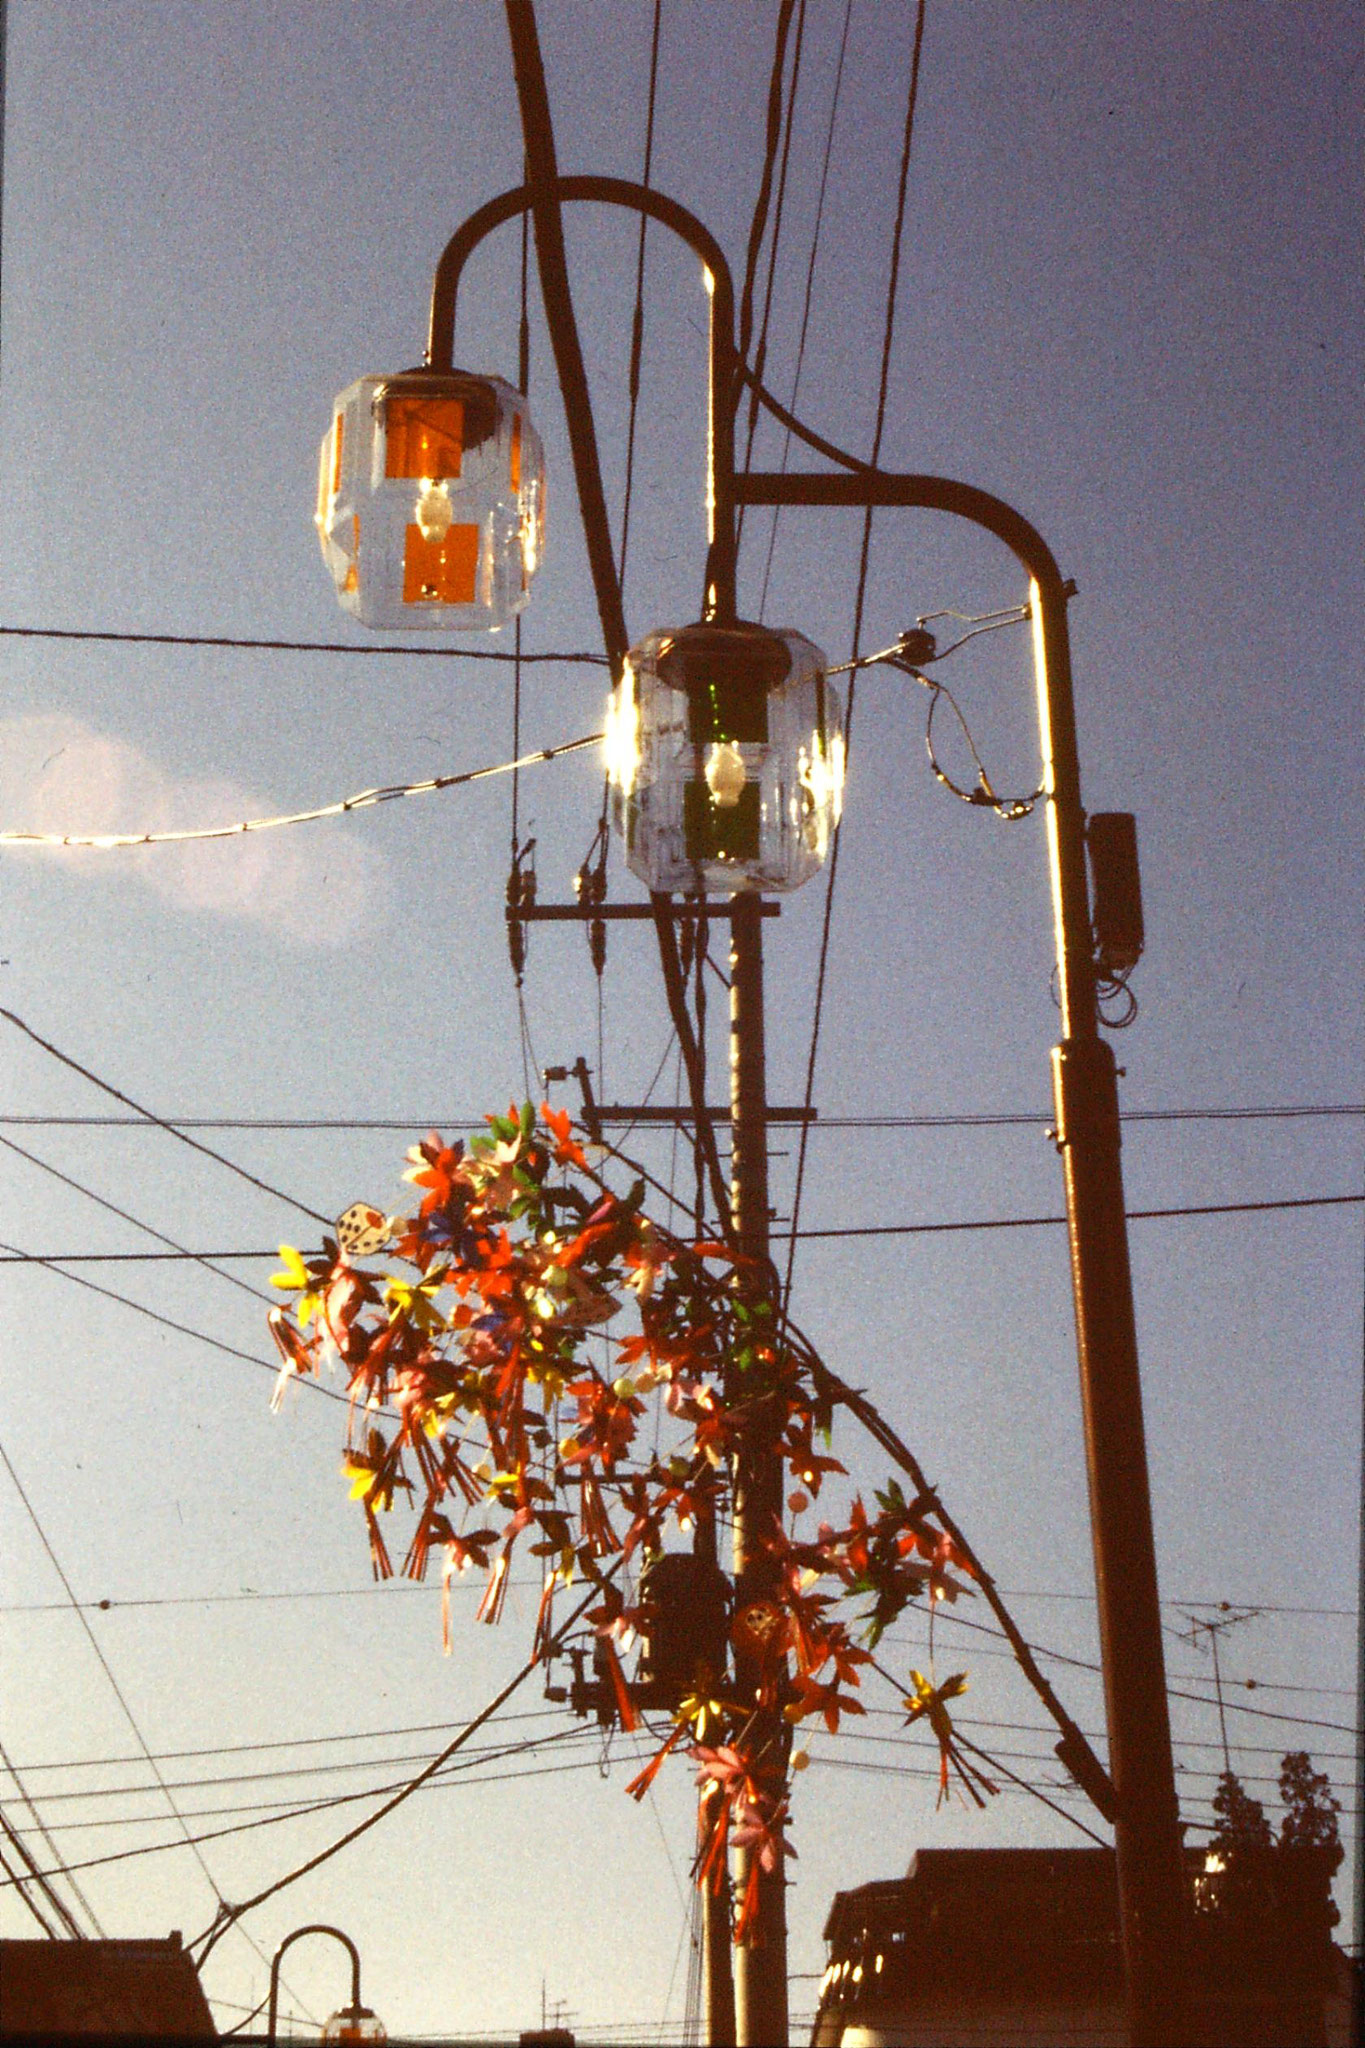 28/12/1988: 25: Tokyo nr Nishimagome